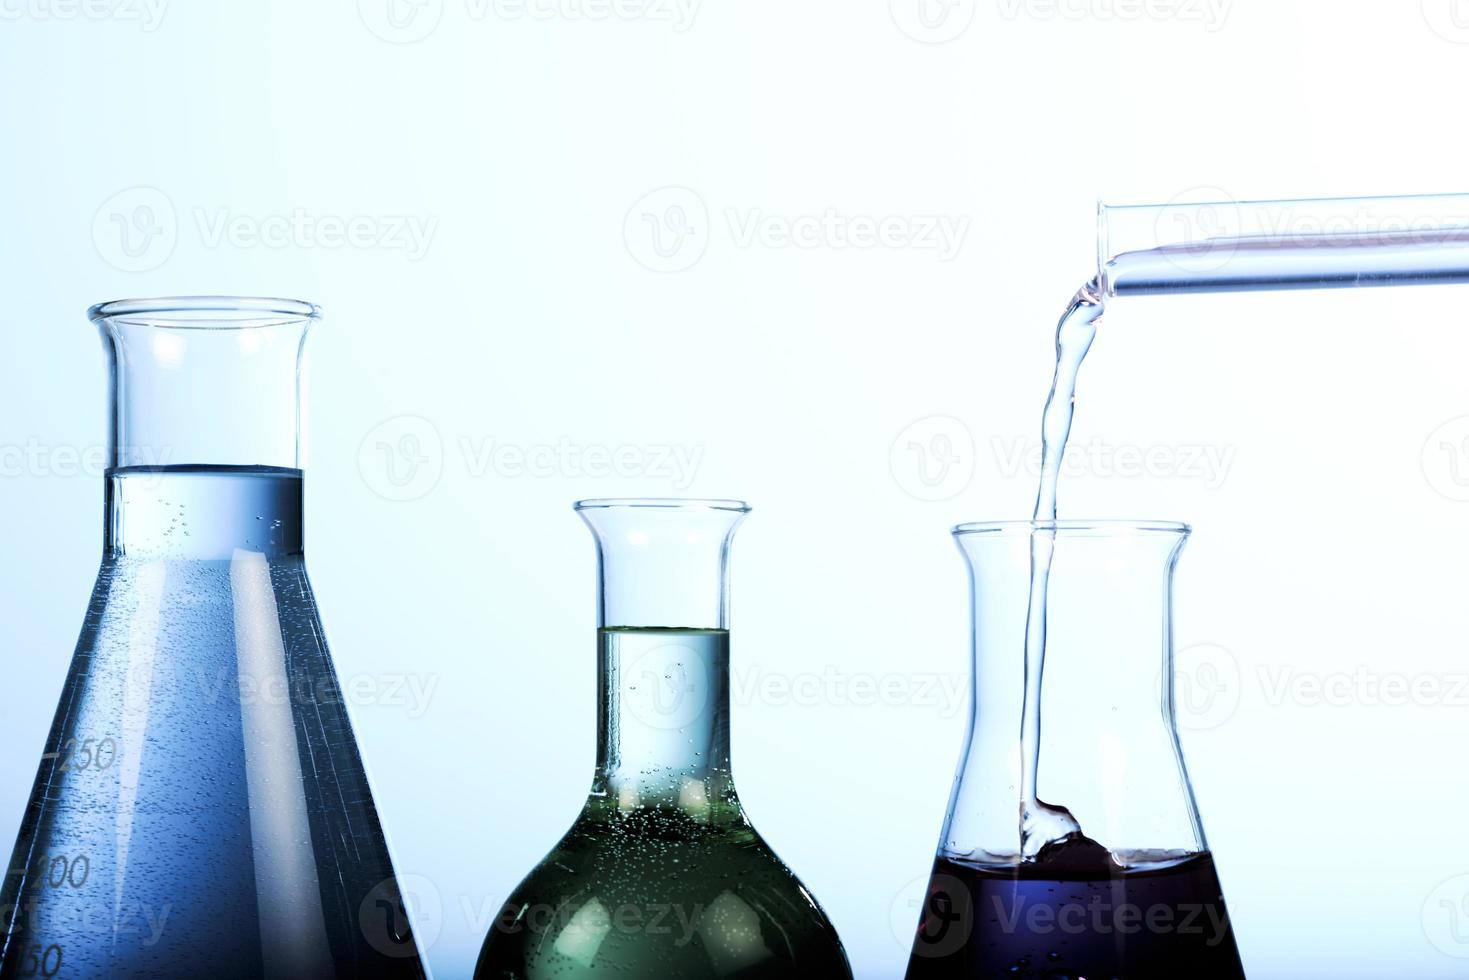 wissenschaftlich-medizinisch - Forschung foto